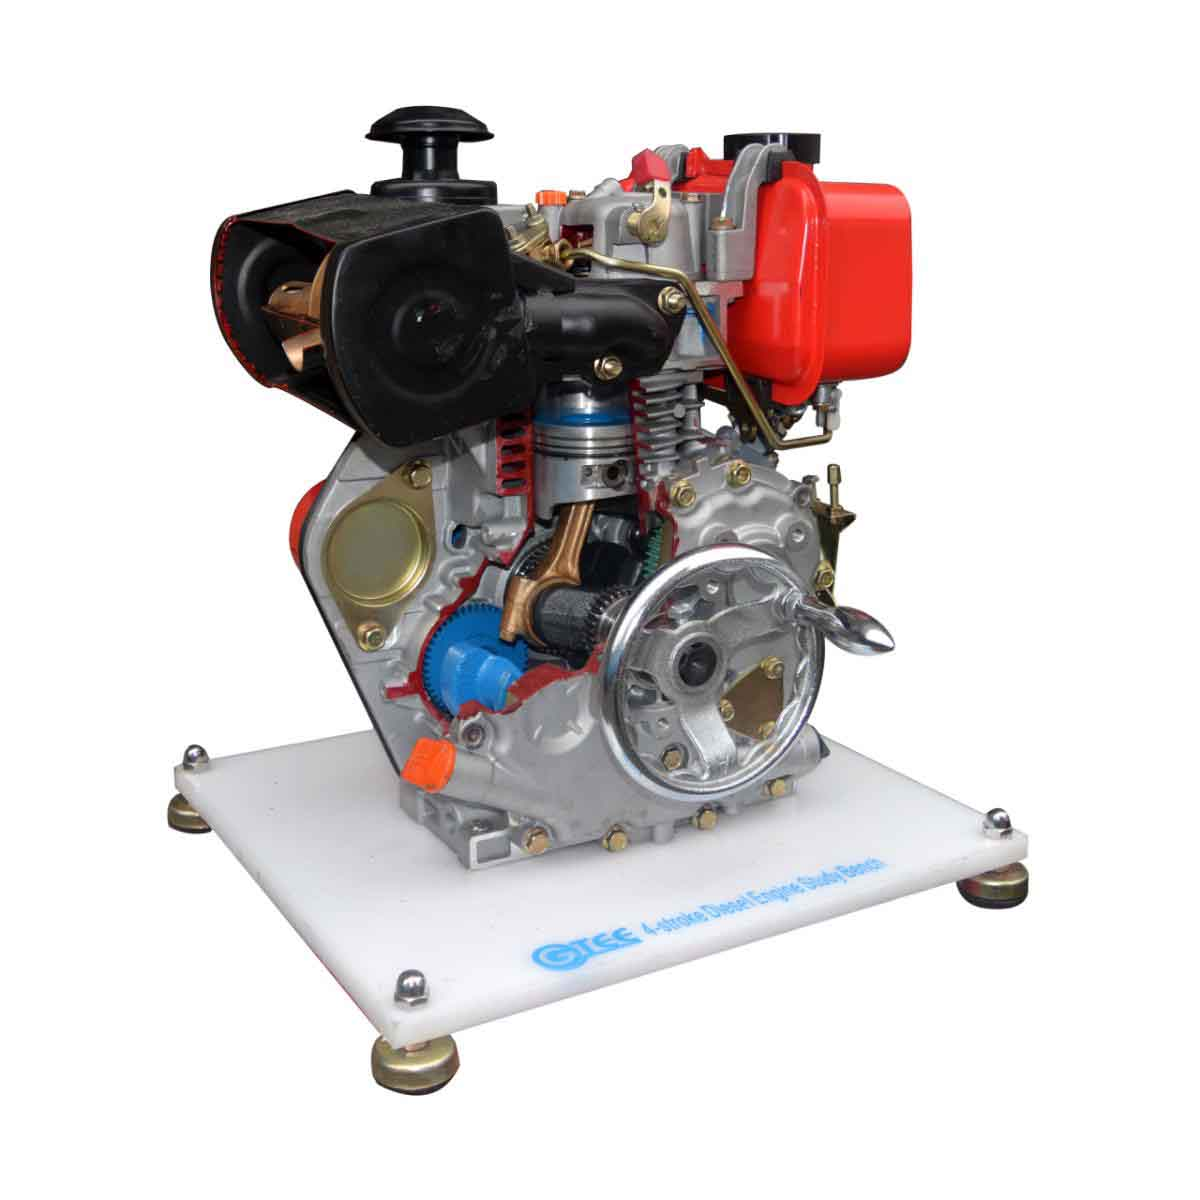 4-strokediesel enginestudy bench automotive training equipment